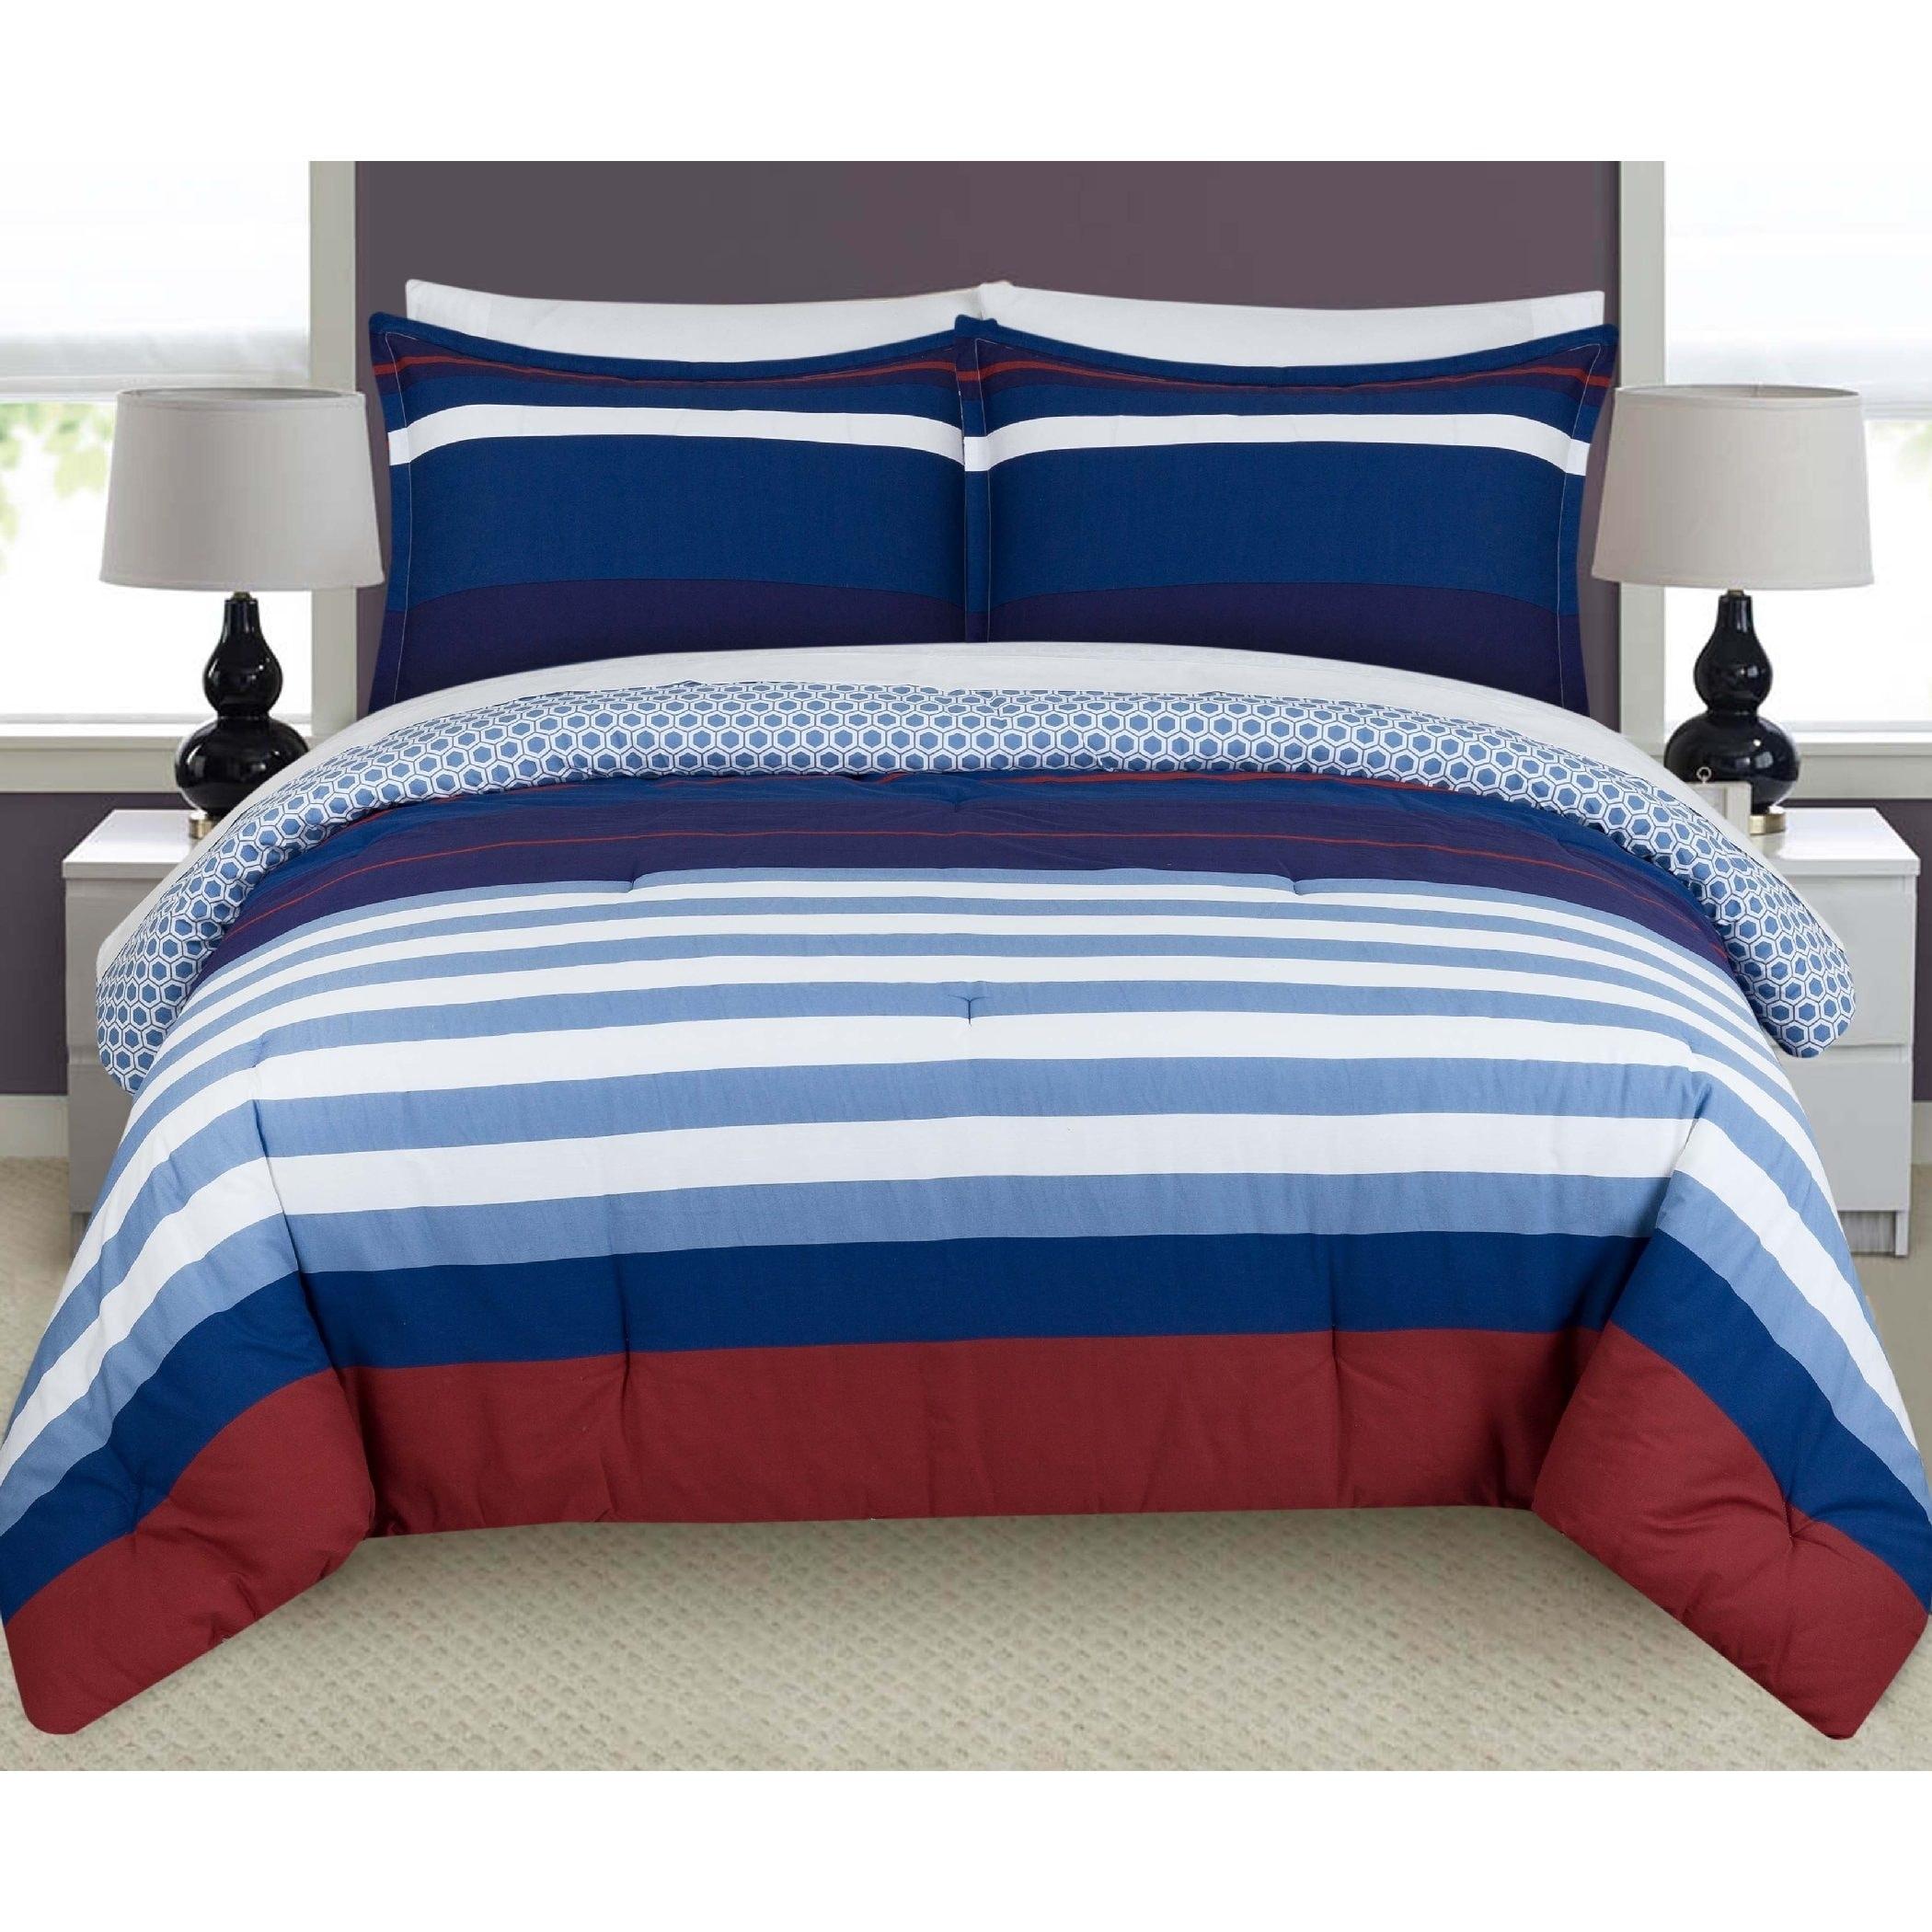 shipping sets bath boys free comforter jojo overstock twin designs piece set bedding sweet nautical product today